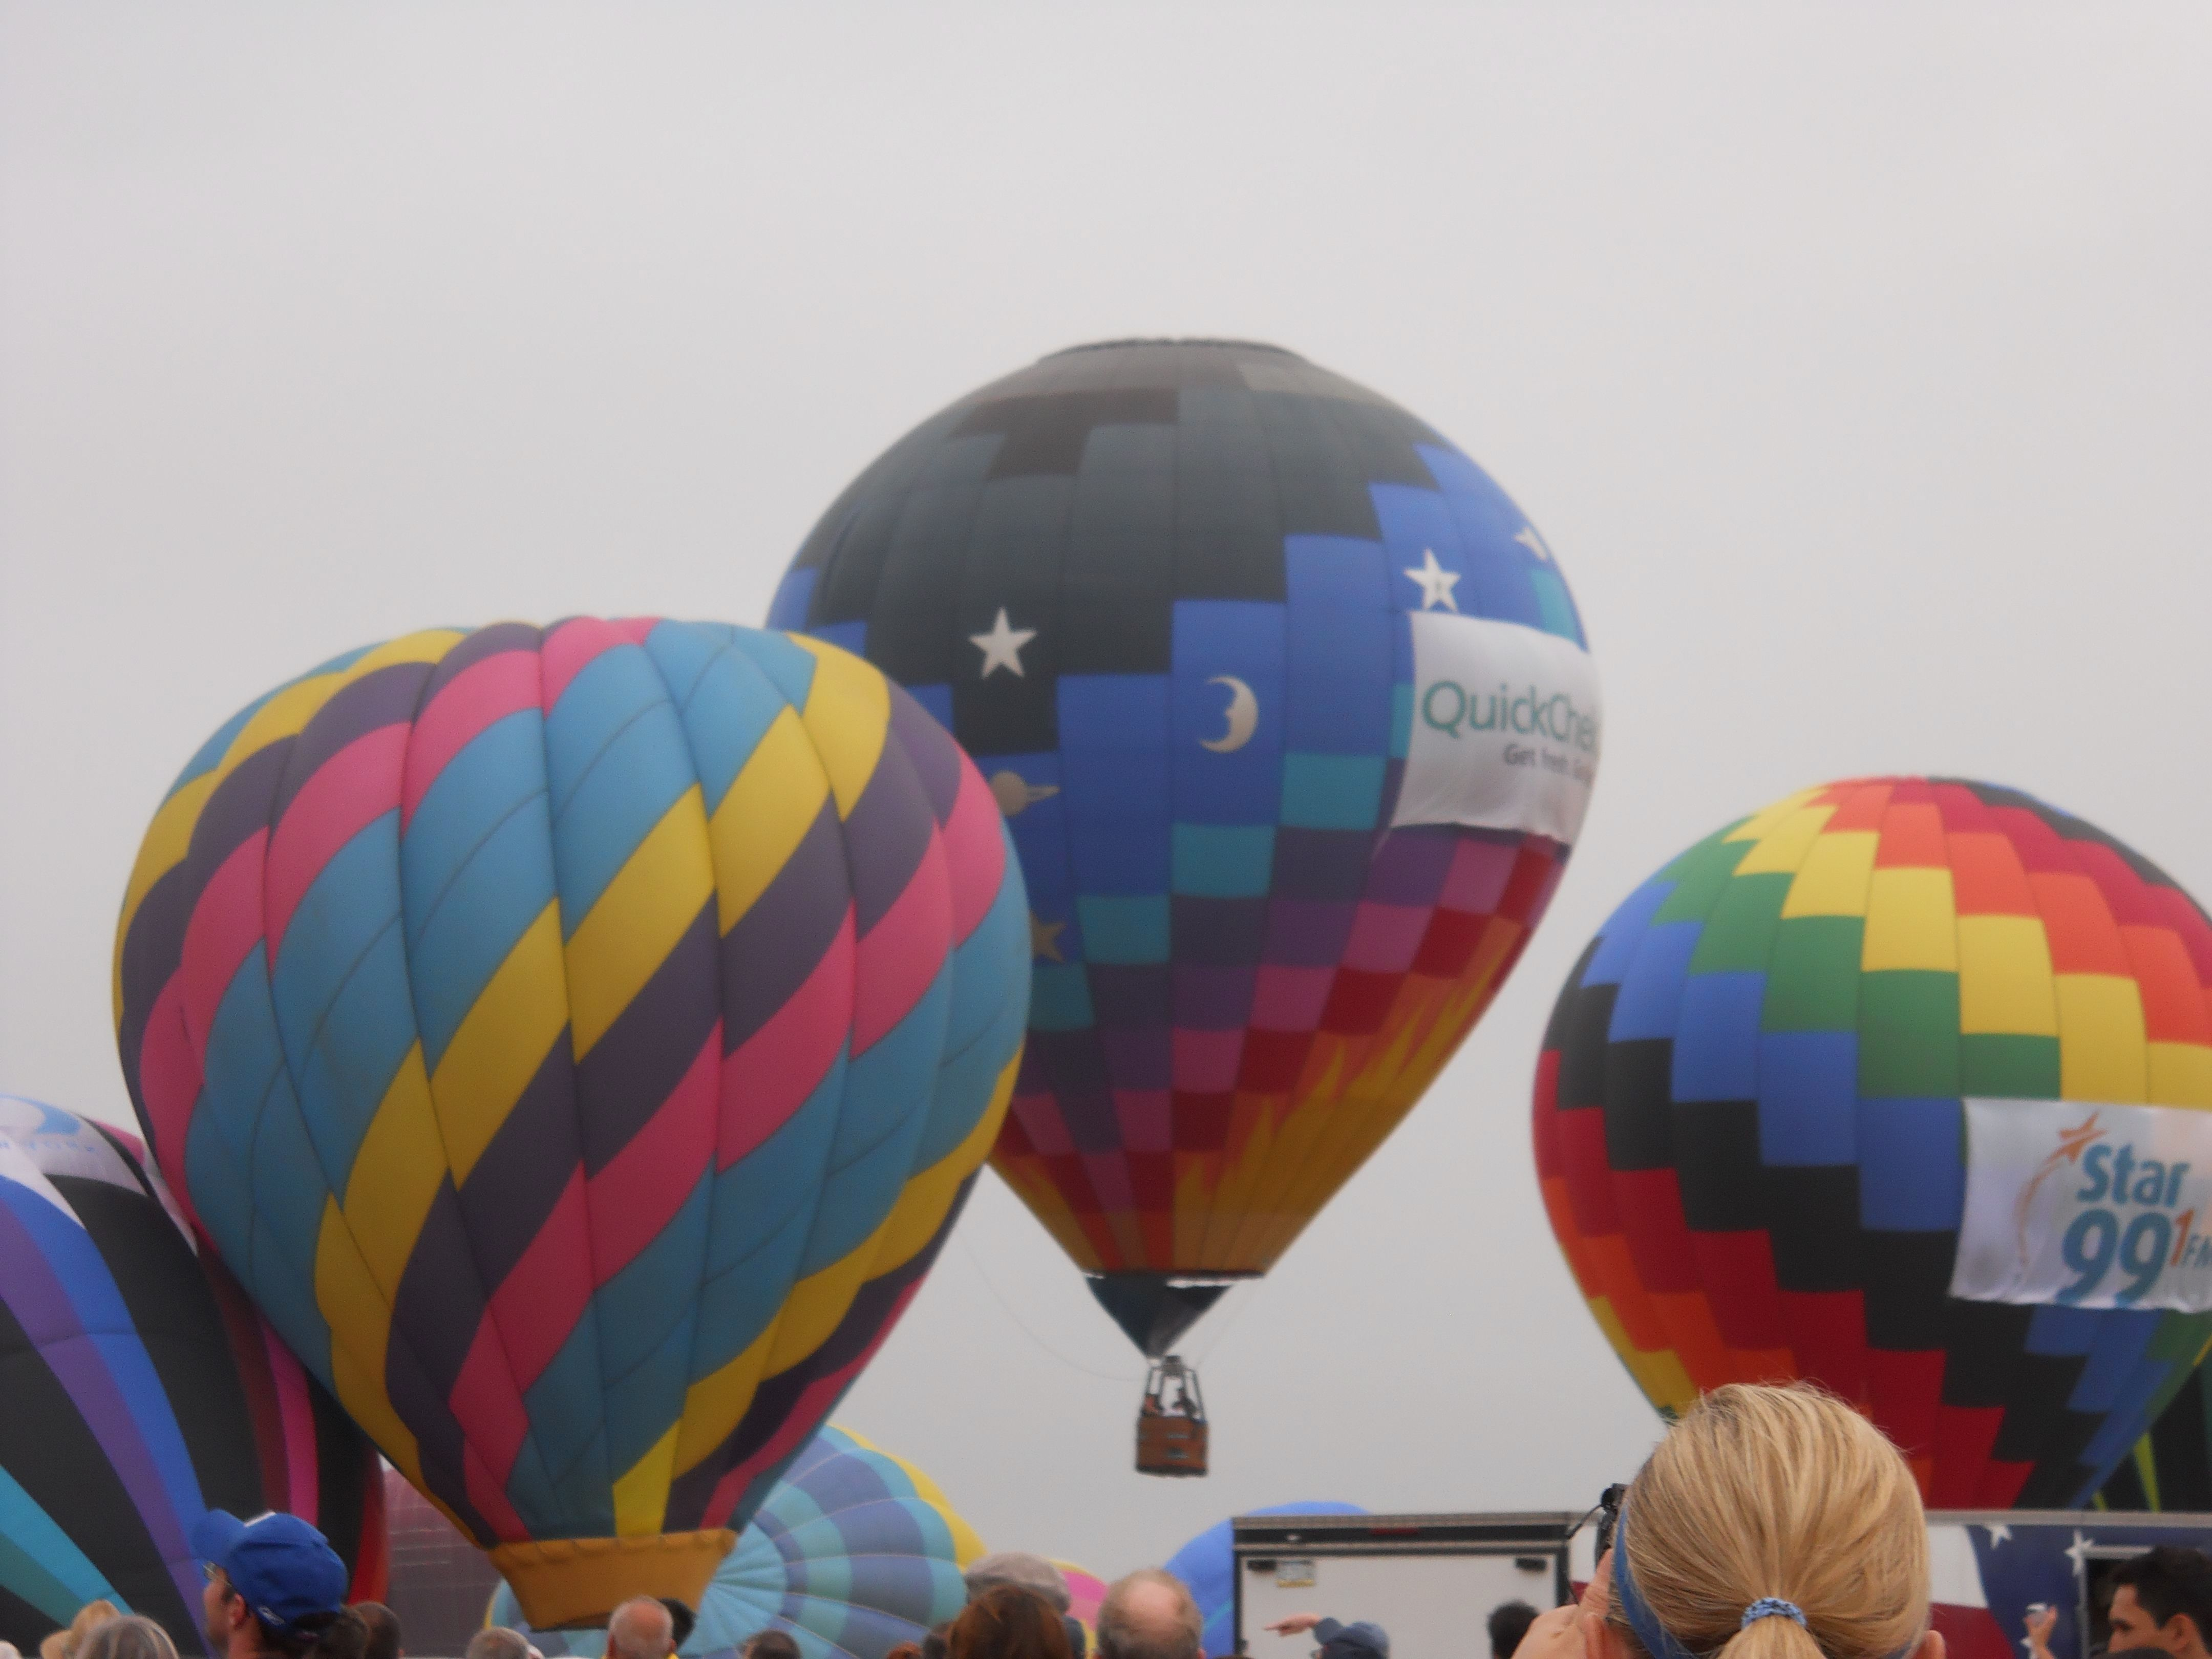 Hot Air Balloon Festival, Readington, NJ — at Solberg